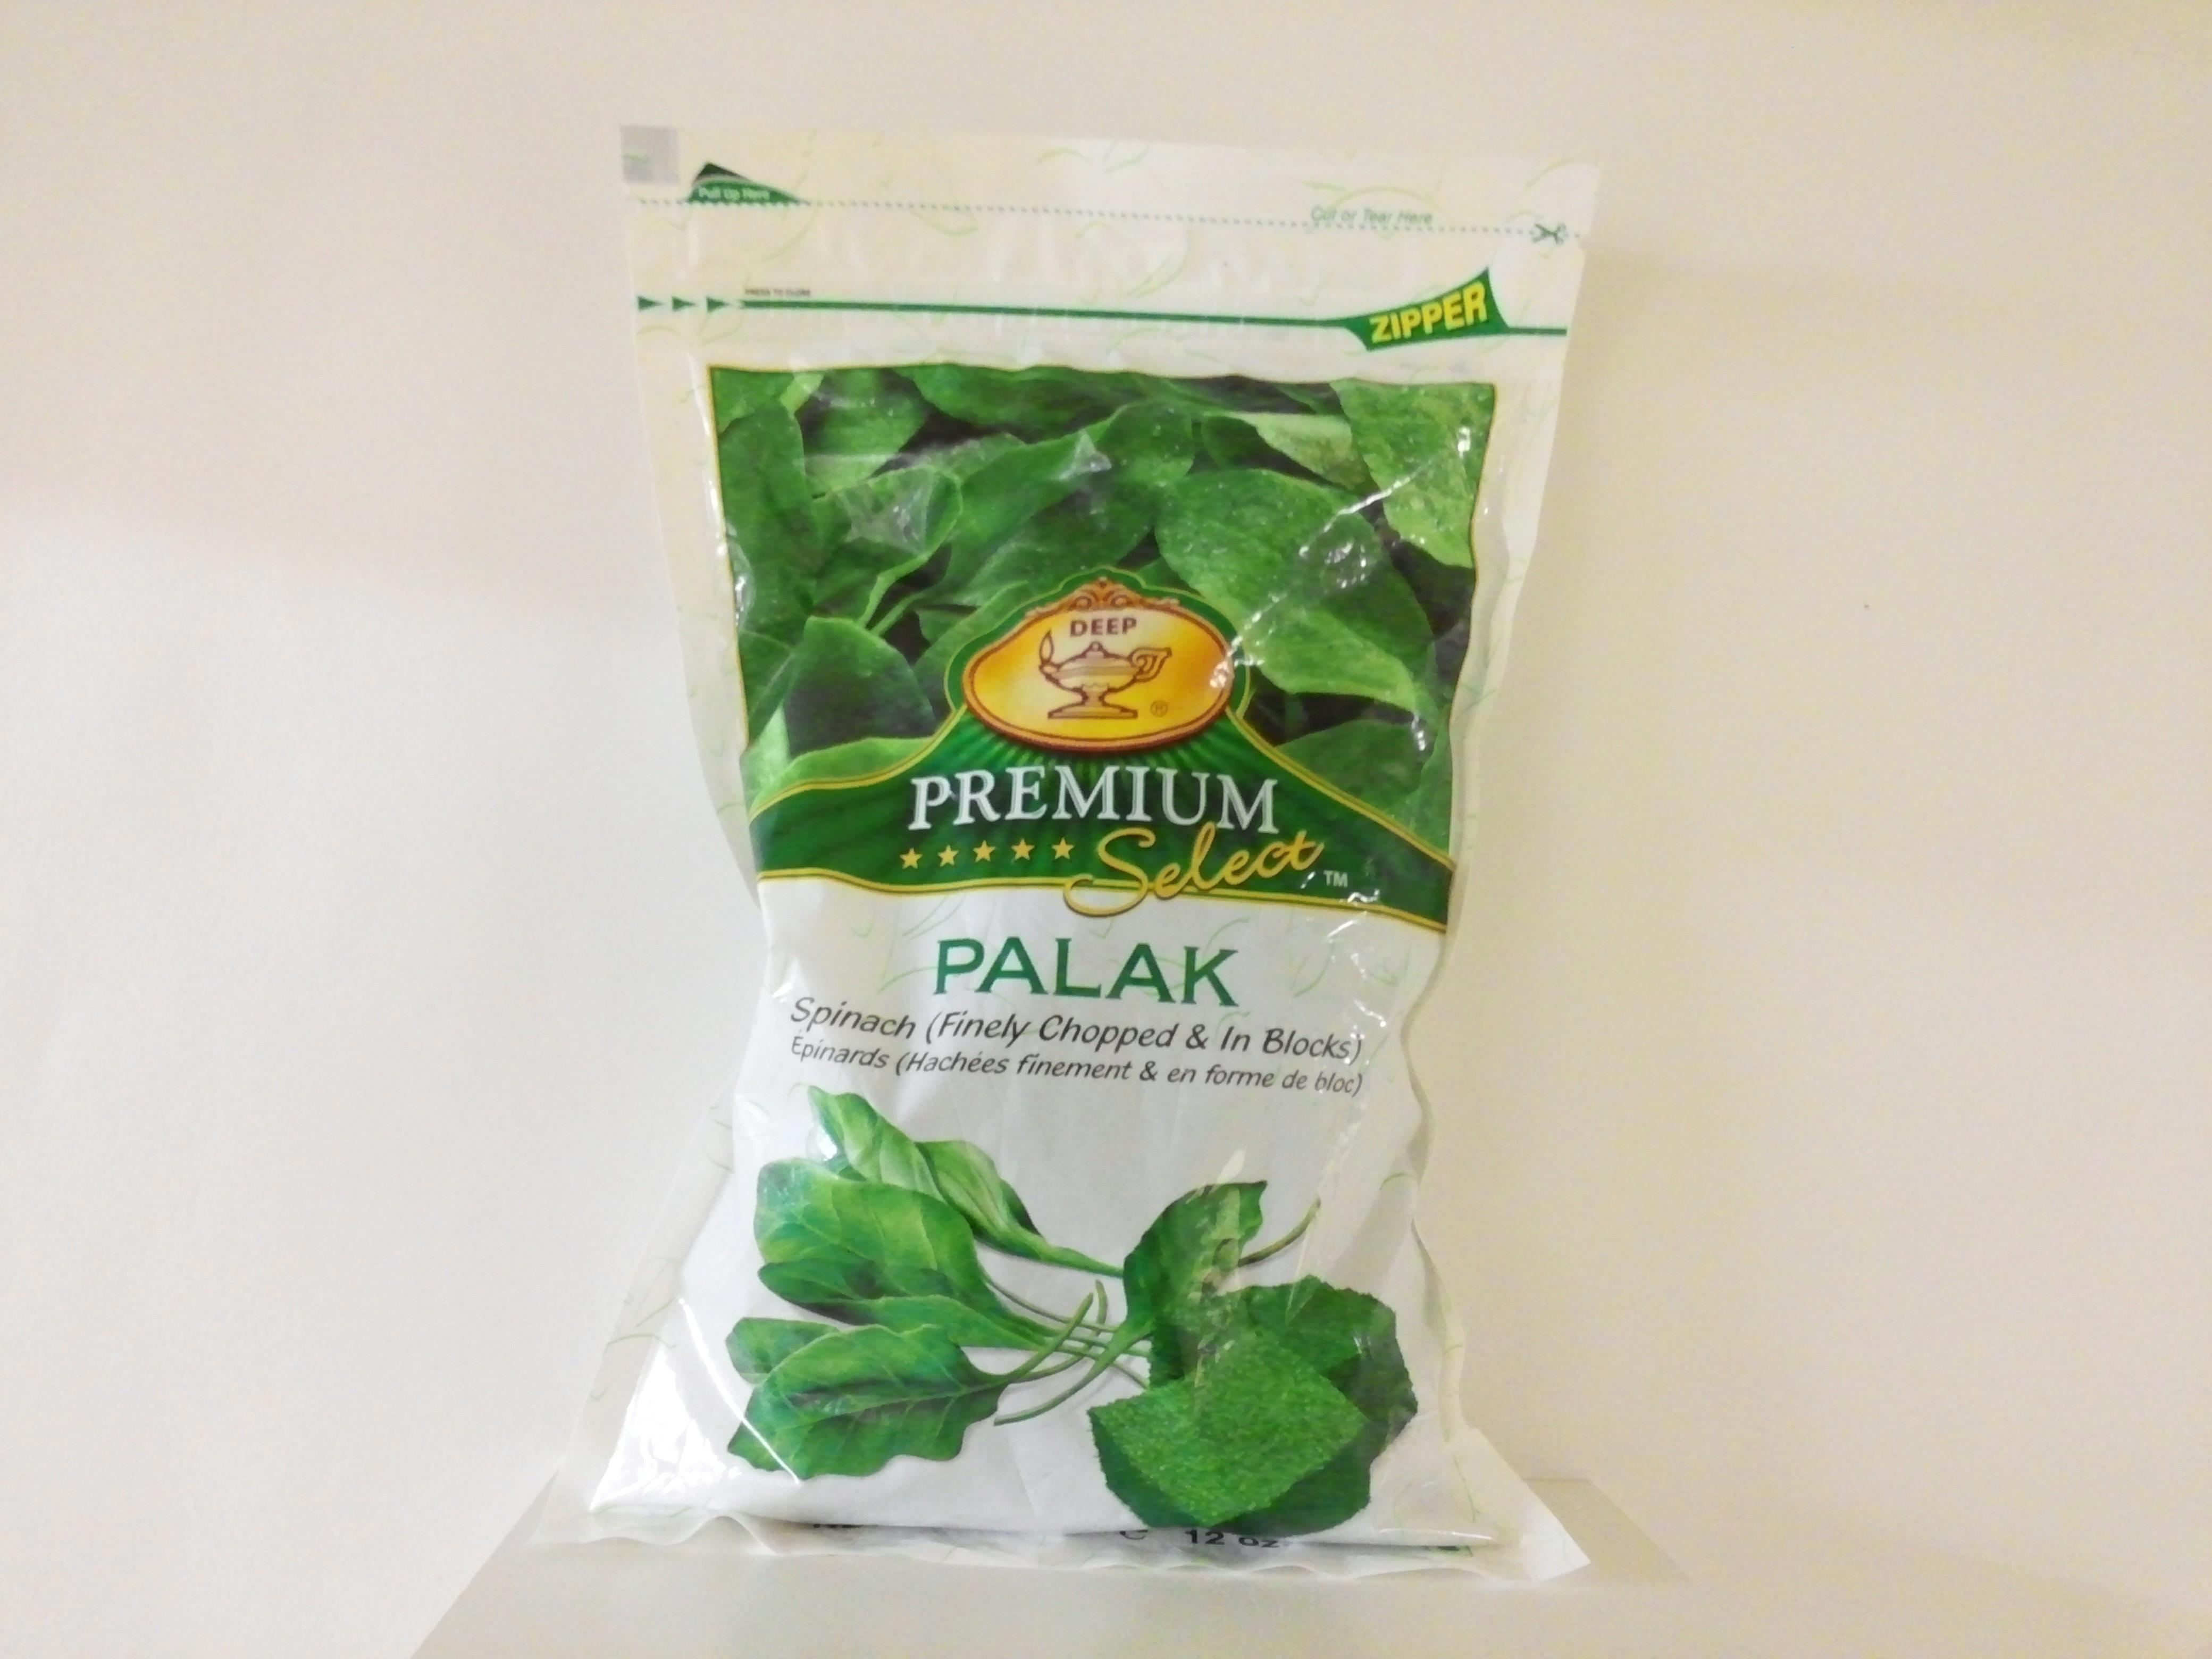 Deep Premium Palak 12 oz